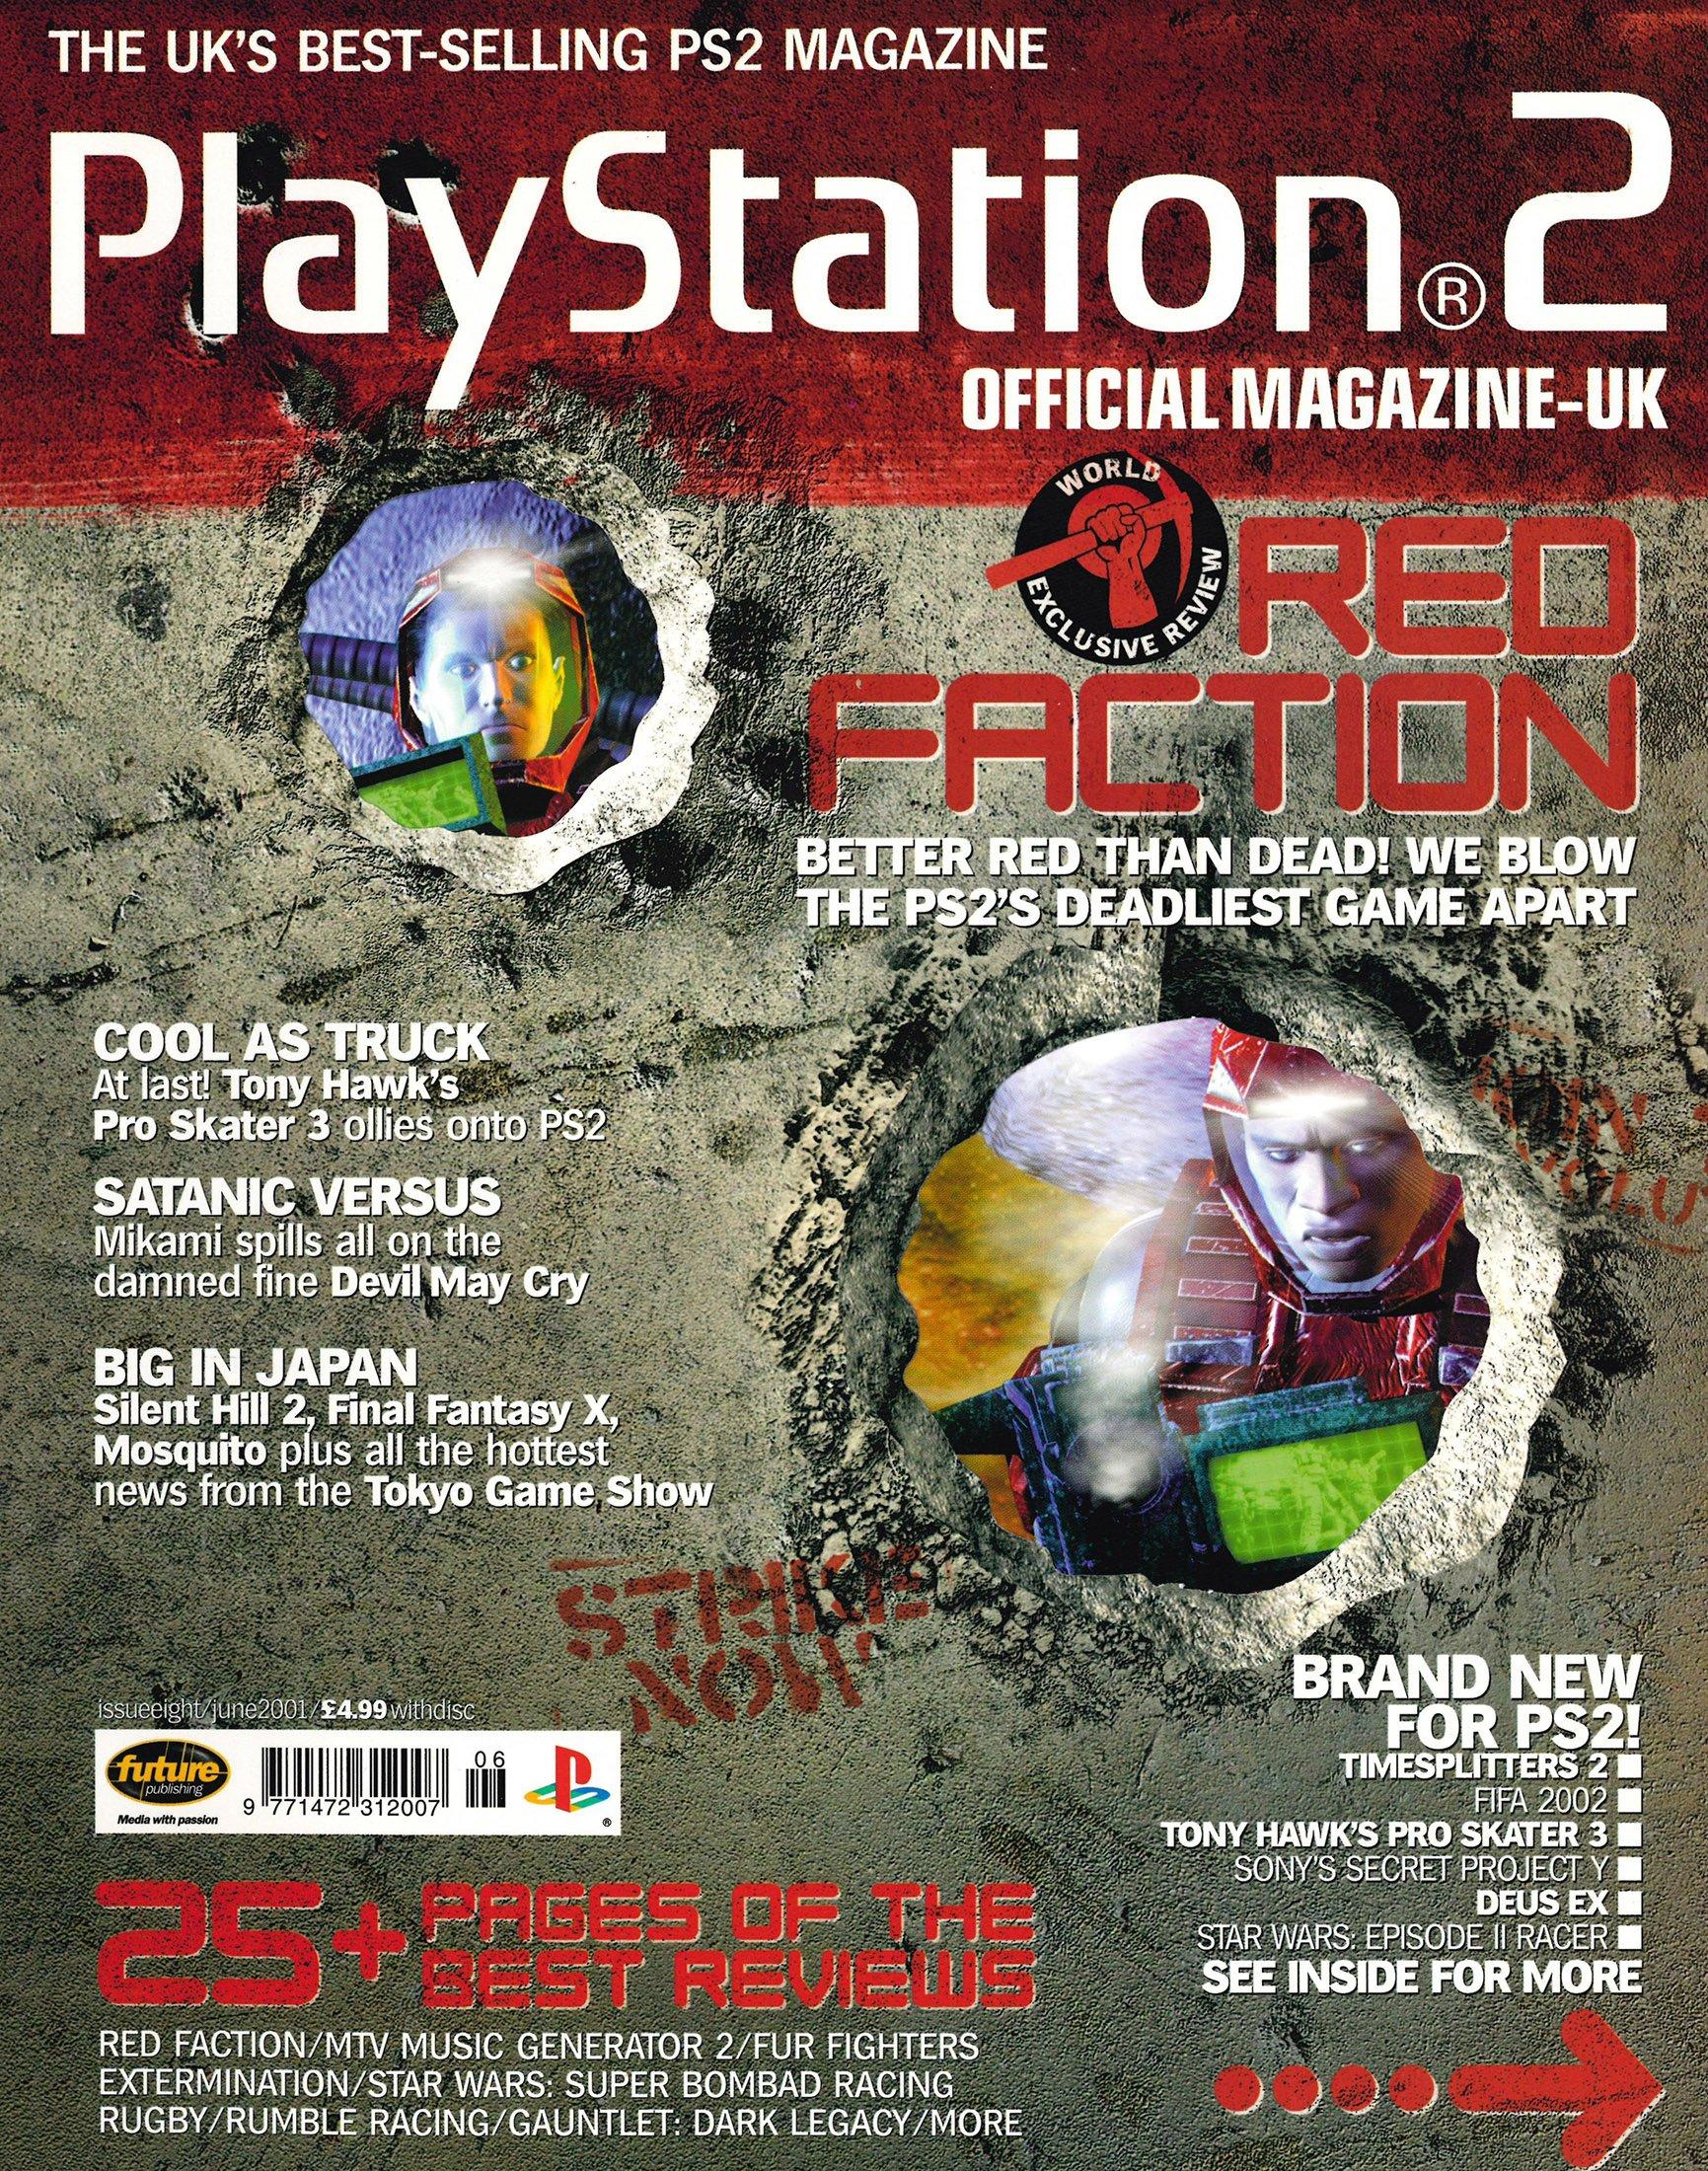 Official Playstation 2 Magazine UK 008 (June 2001)